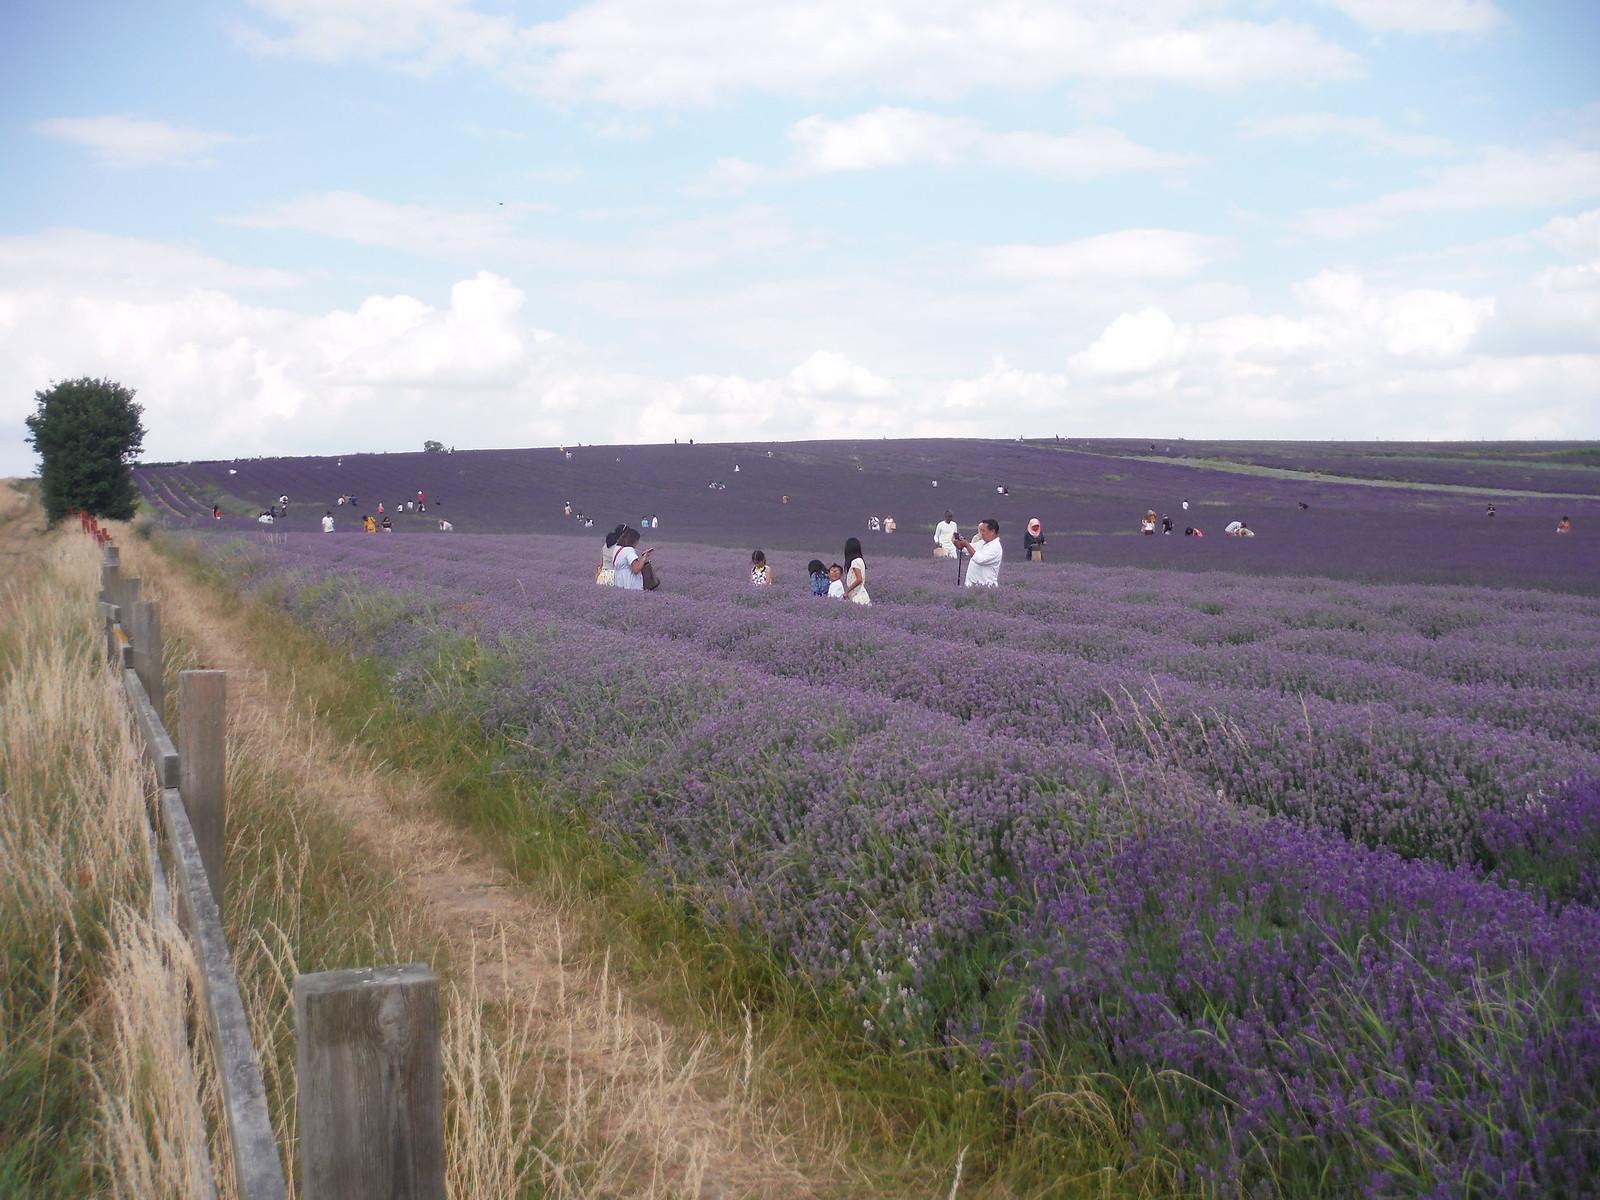 Main Field, Hitchin Lavender (Cadwell Farm) SWC Walk 233 - Arlesey to Letchworth Garden City